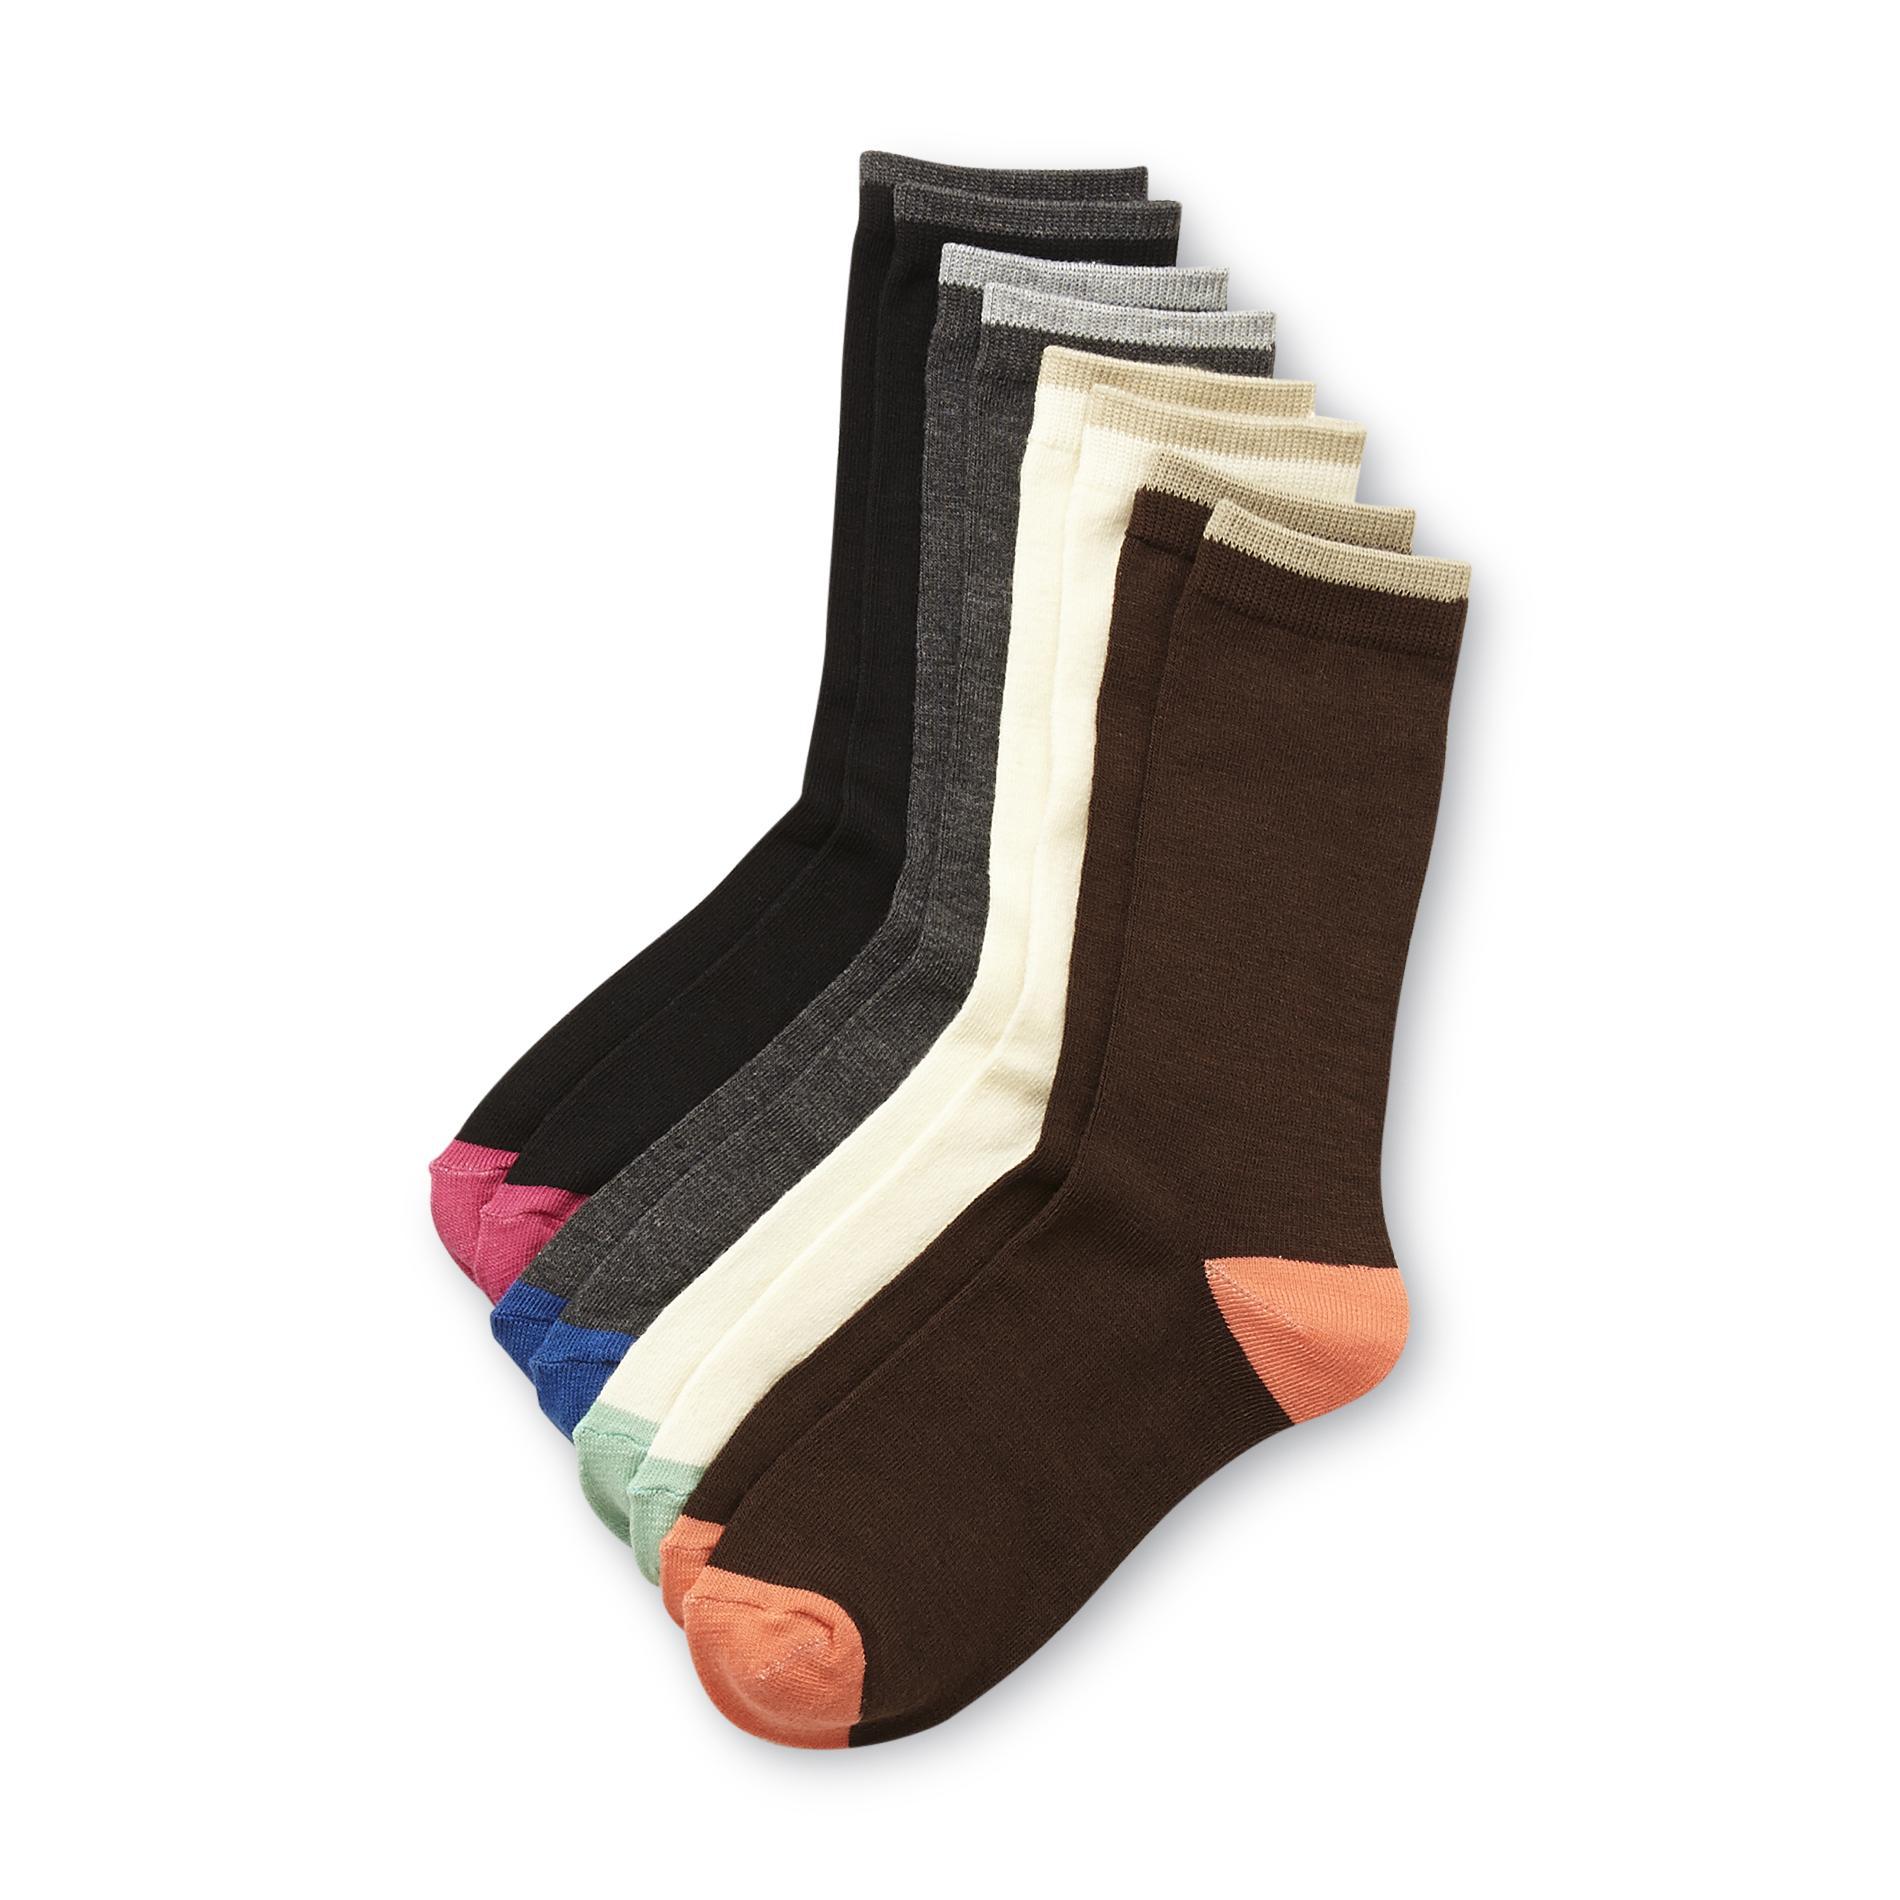 Studio S Women's 4-Pairs Crew Socks - Colorblock PartNumber: 07524218000P KsnValue: 8102393 MfgPartNumber: 5720314